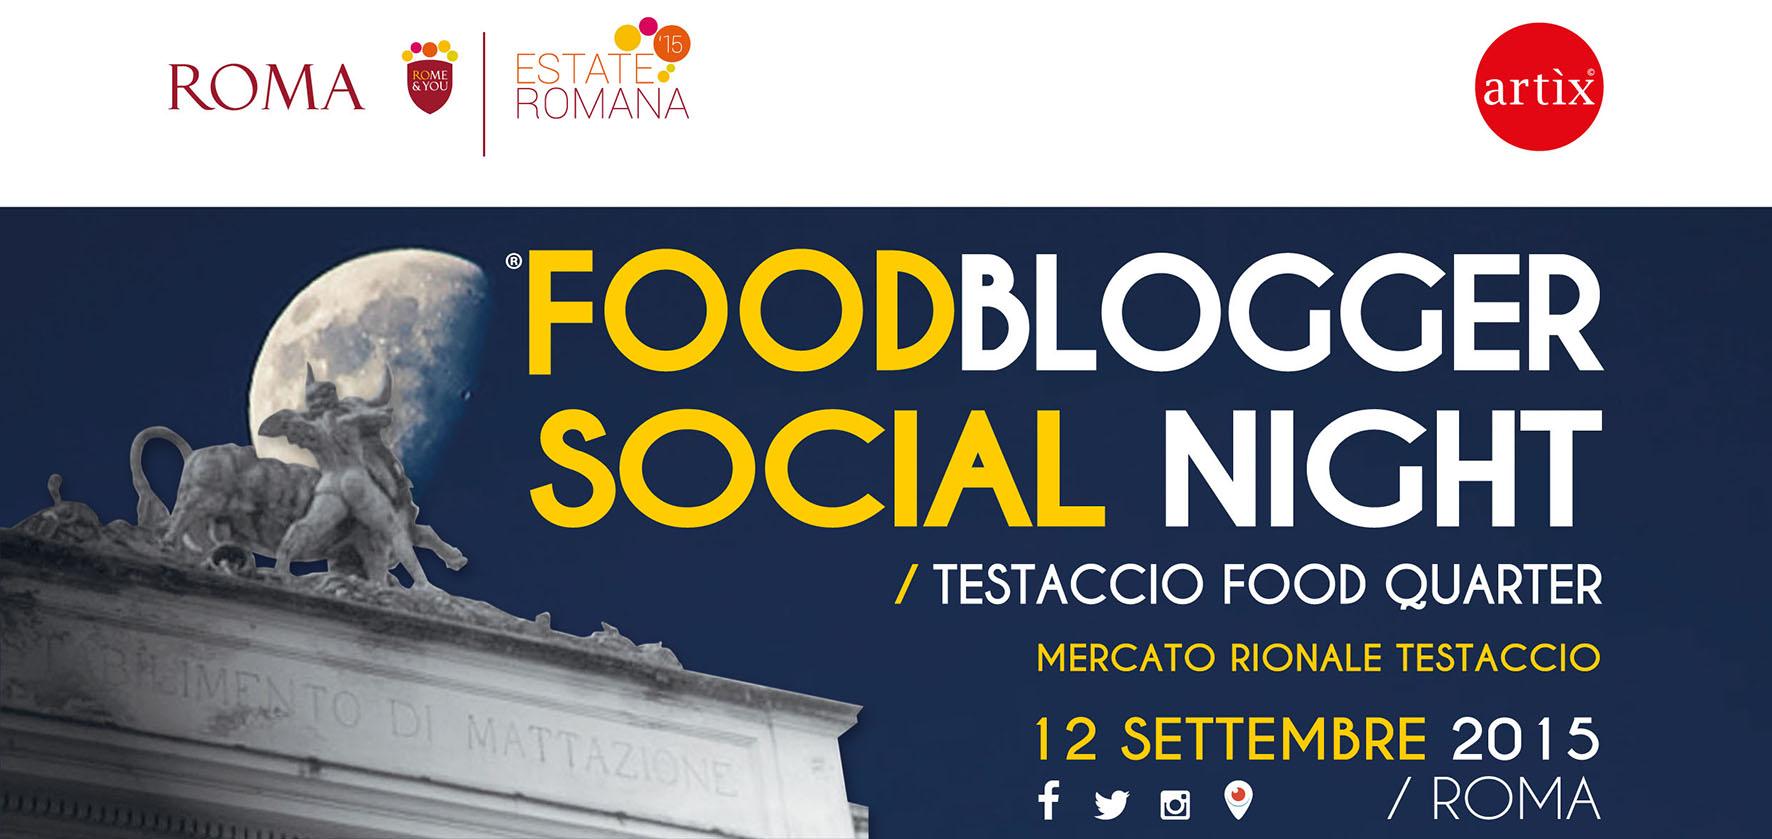 Food blogger Social Night: a Roma accadono cose buone